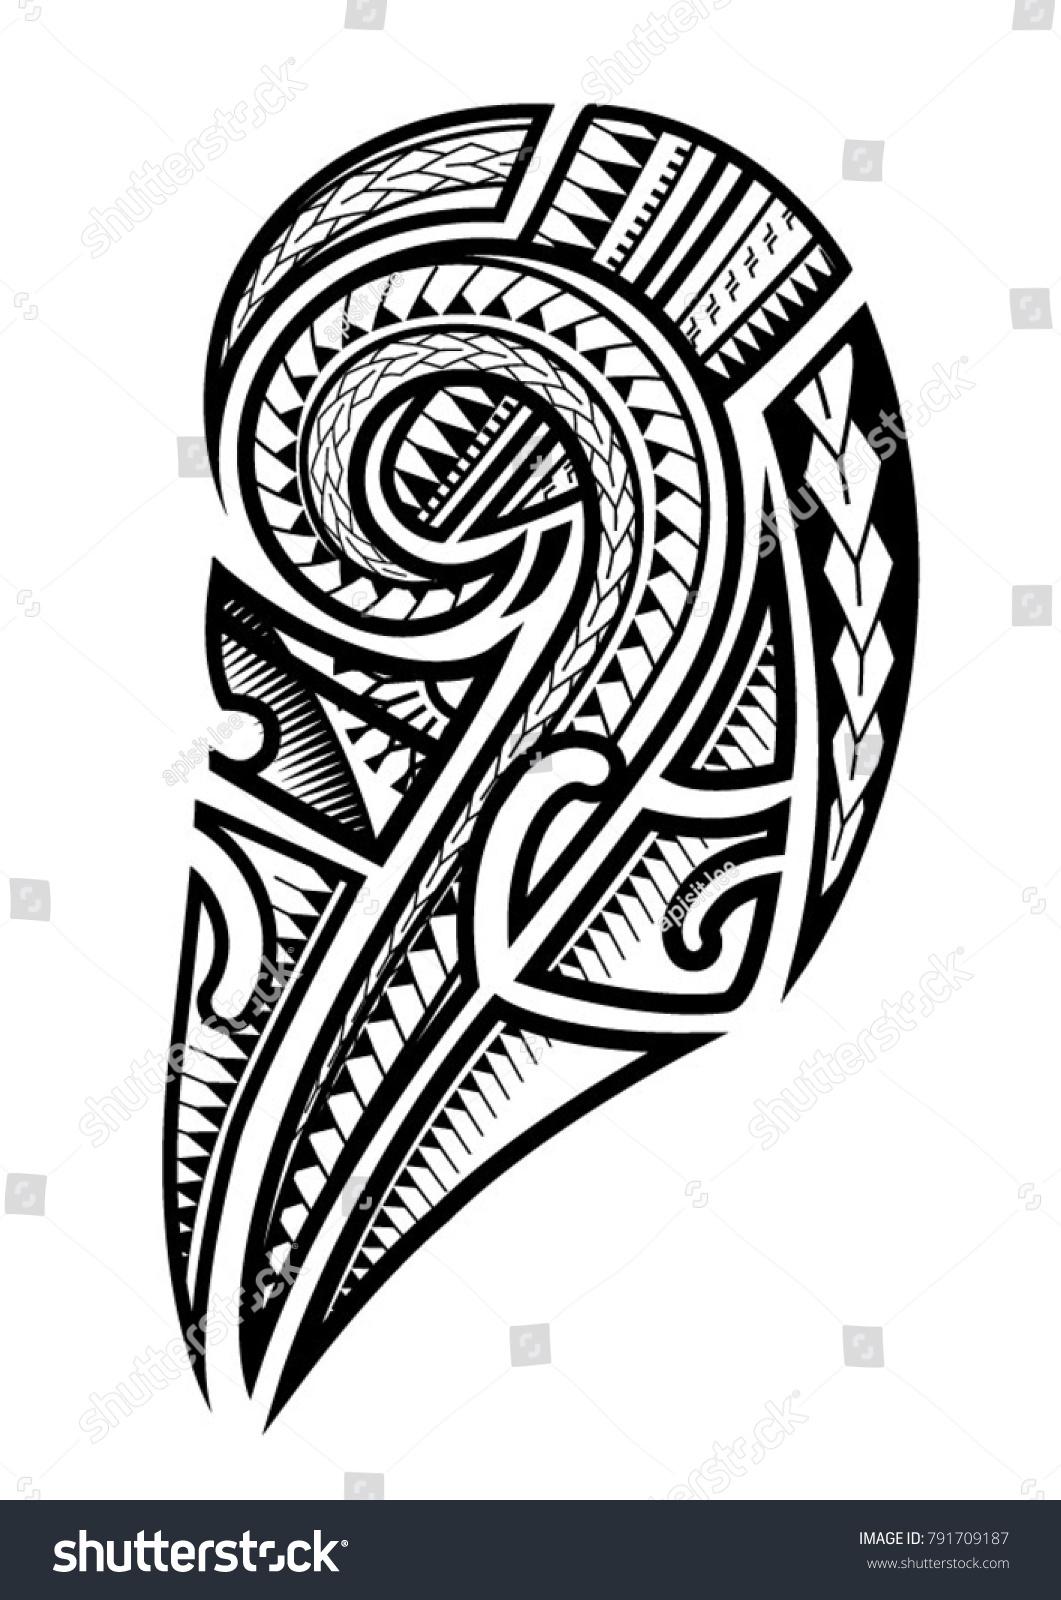 Samoan Tattoo For Upper Arm